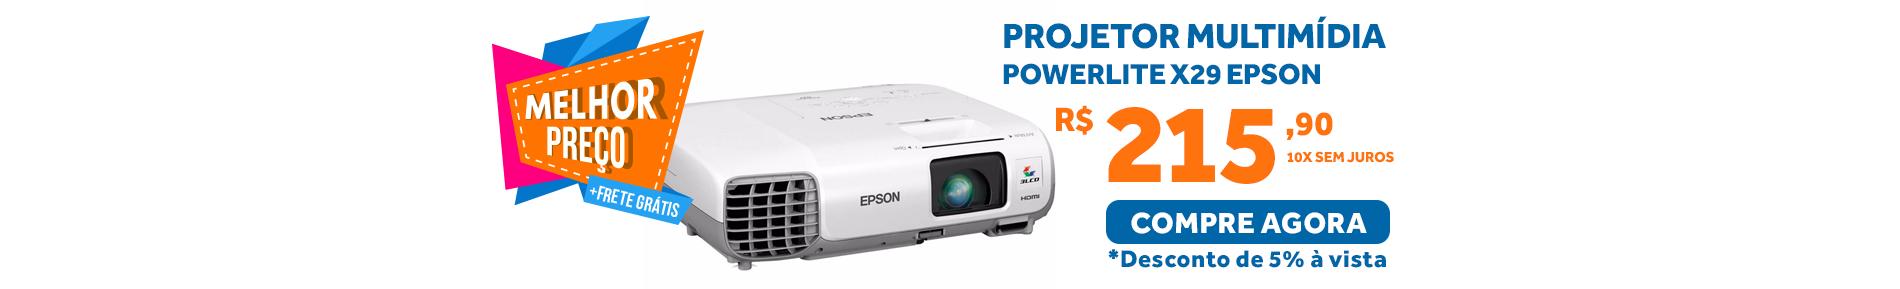 projetor multimÍdia powerlite x29 epson